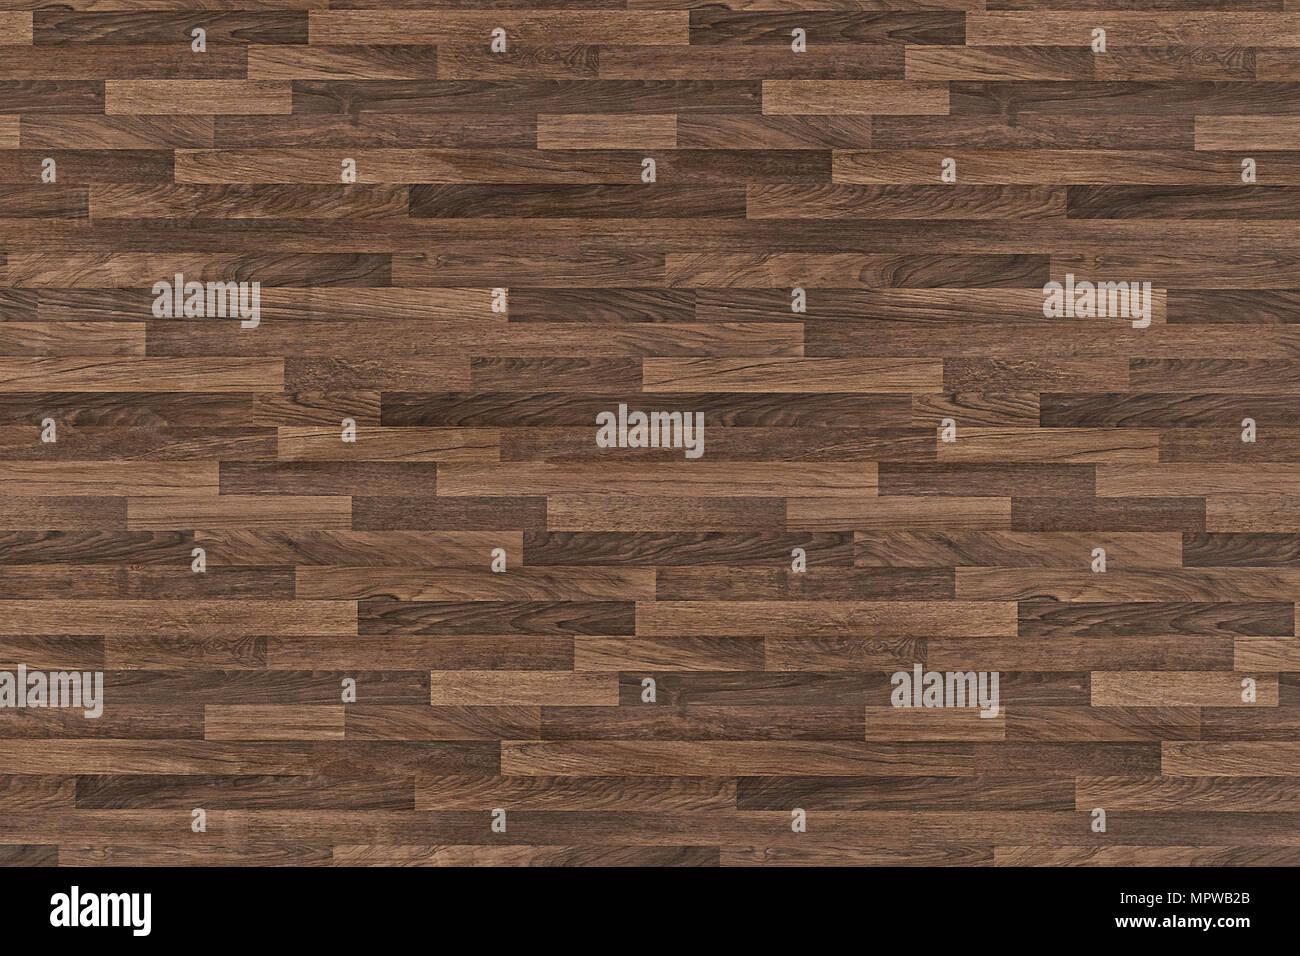 parquet floor texture stock photos parquet floor texture stock